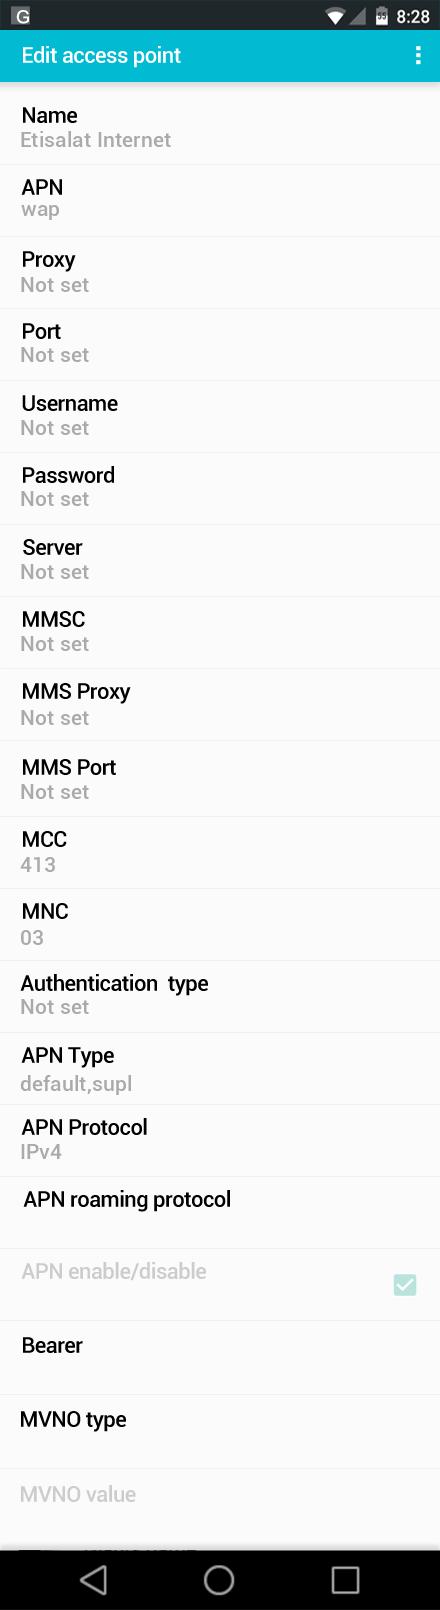 Etisalat Internet APN settings for Android screenshot